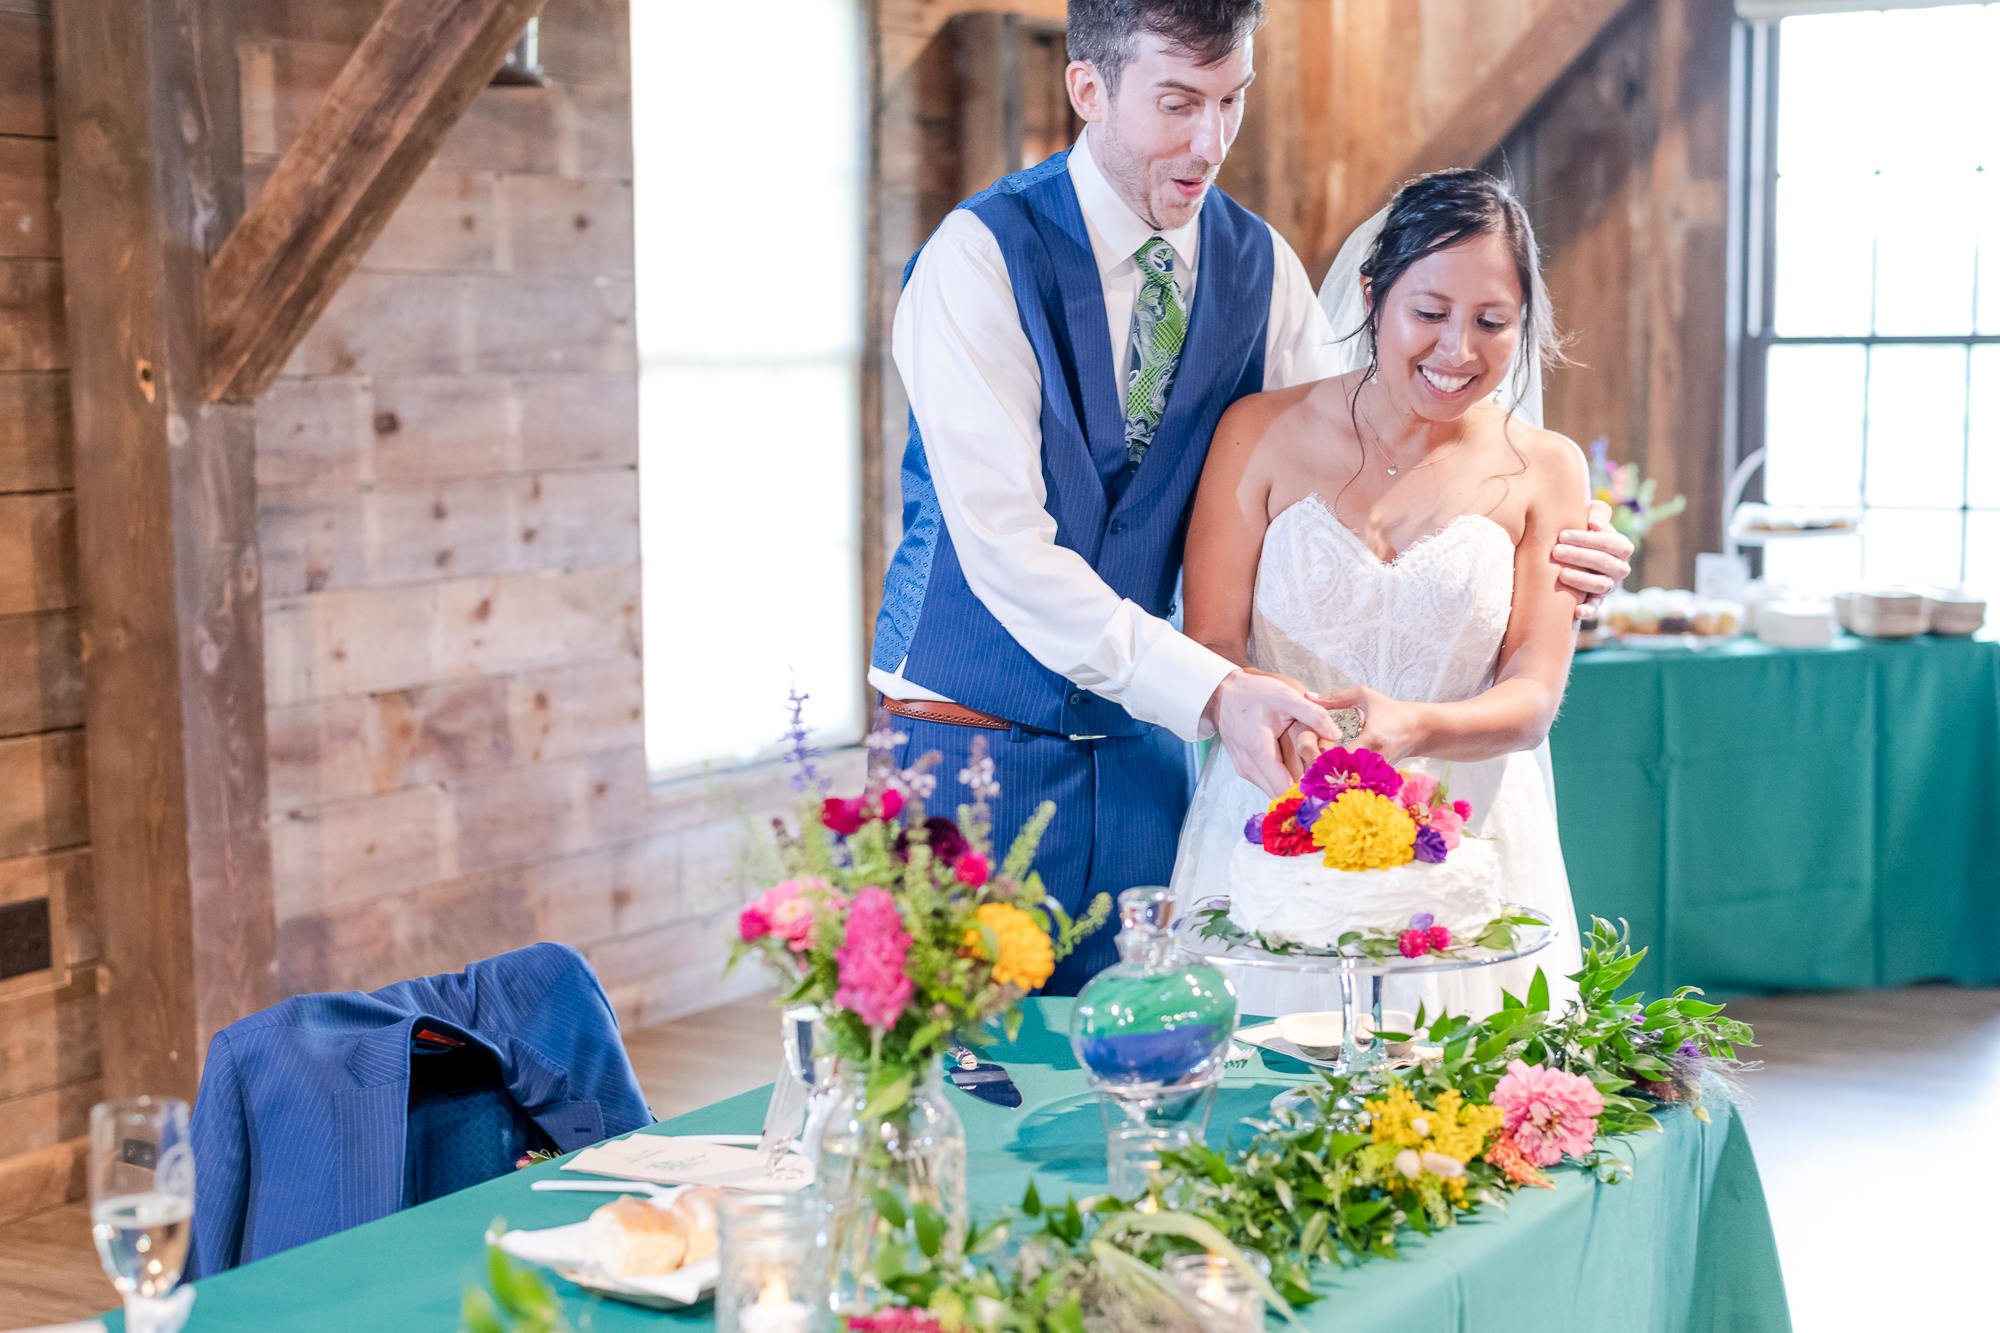 Maria+Adam_Summer Barn Wedding_The Barn at The North Star Preserve_Oberlin_Ohio-185.jpg